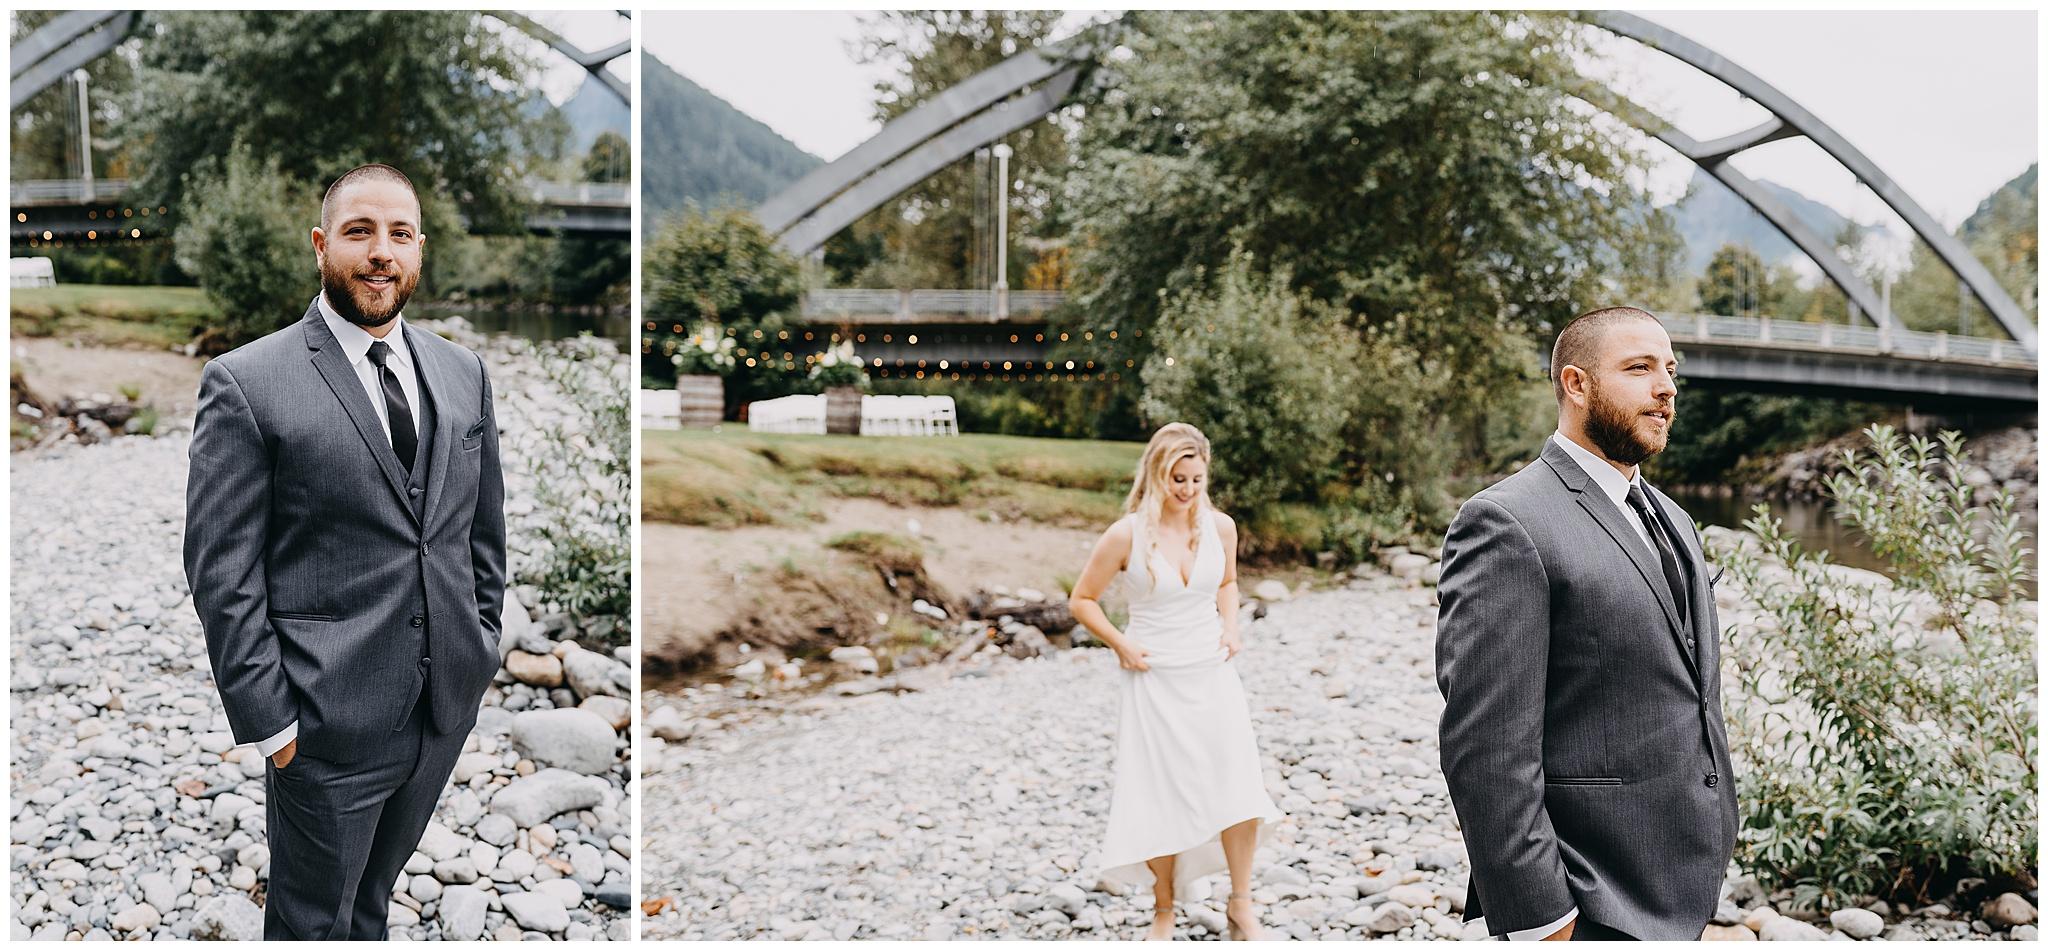 index-wa-wedding16.jpg